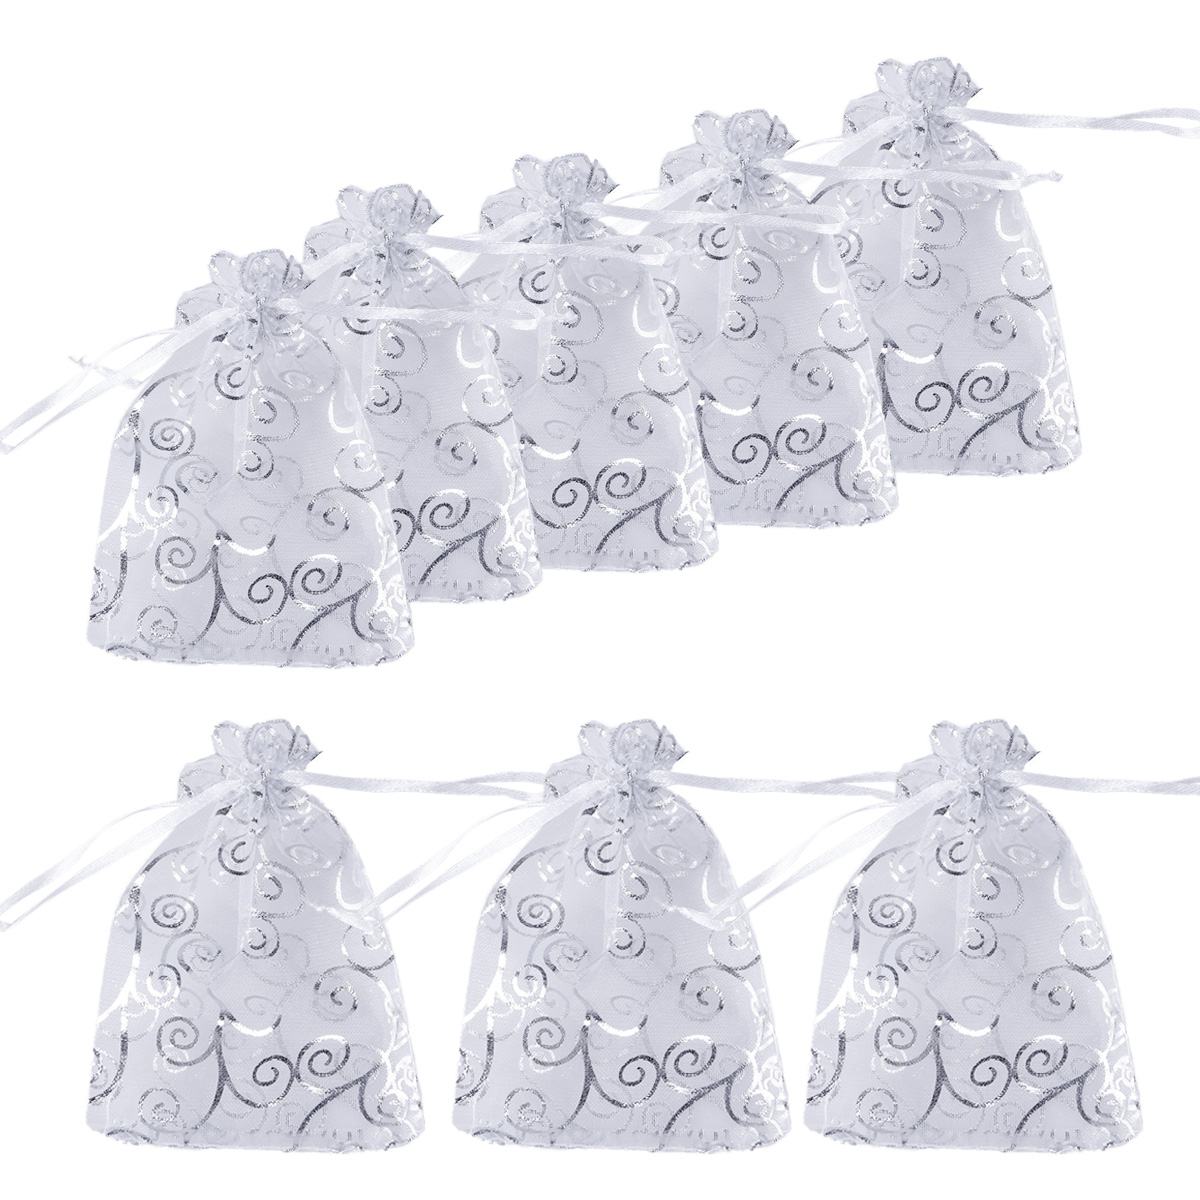 50Pcs Gift Wrap Storage Mini Sheer Organza Decorative Drawstring Rattan Pattern Favor Candy Jewelry Pouches Bags